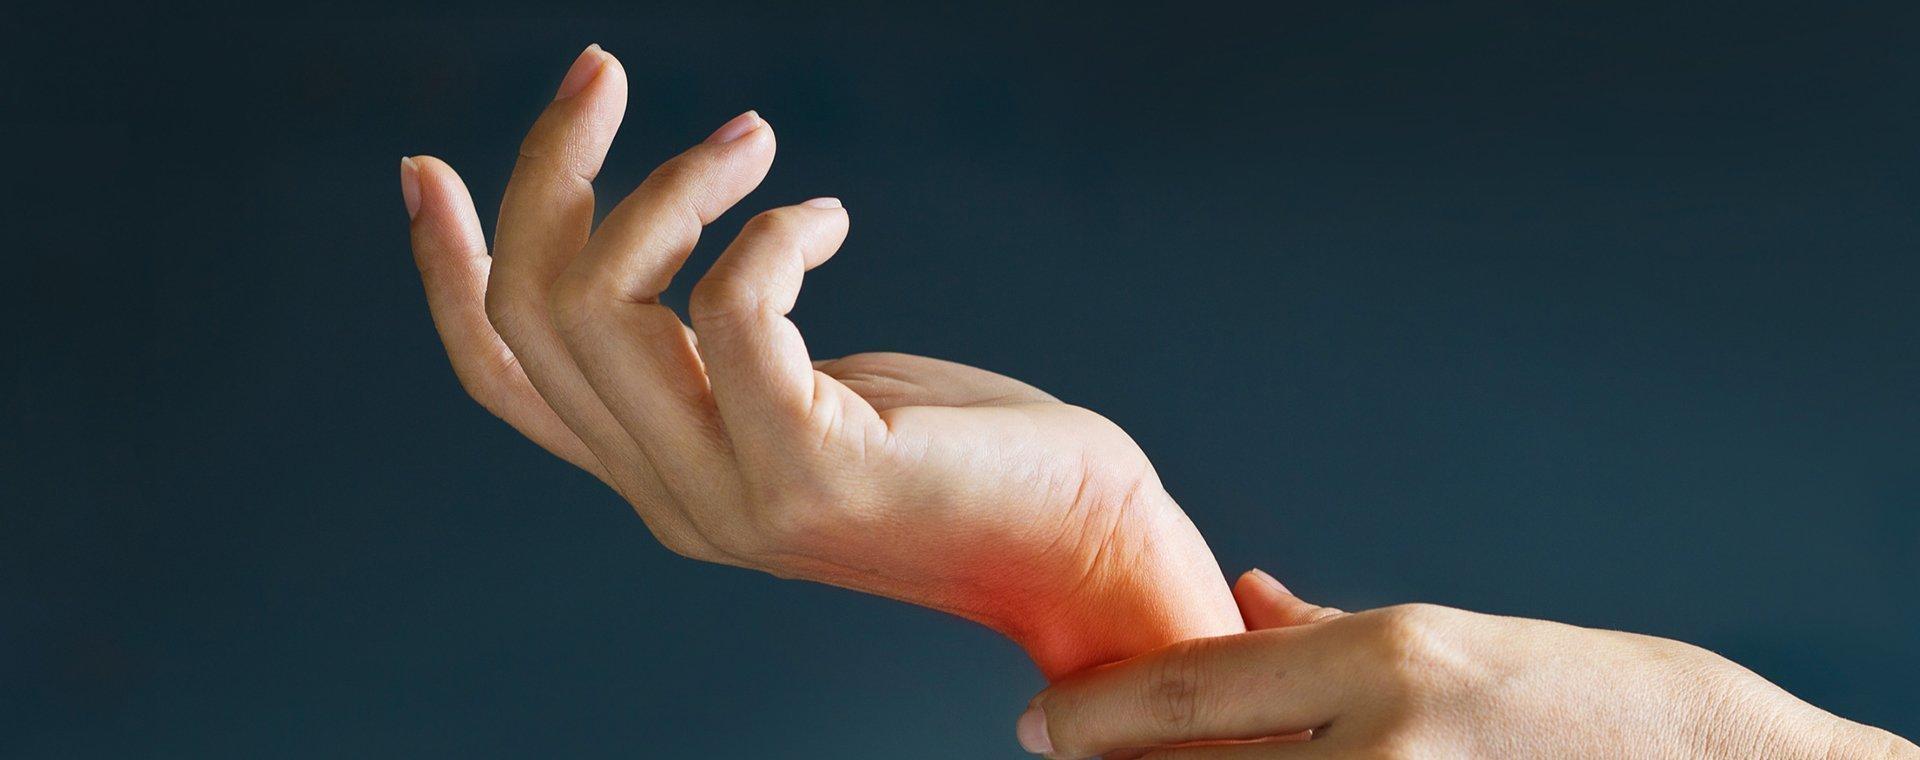 Tout savoir sur les polyarthrites rhumatoïdes